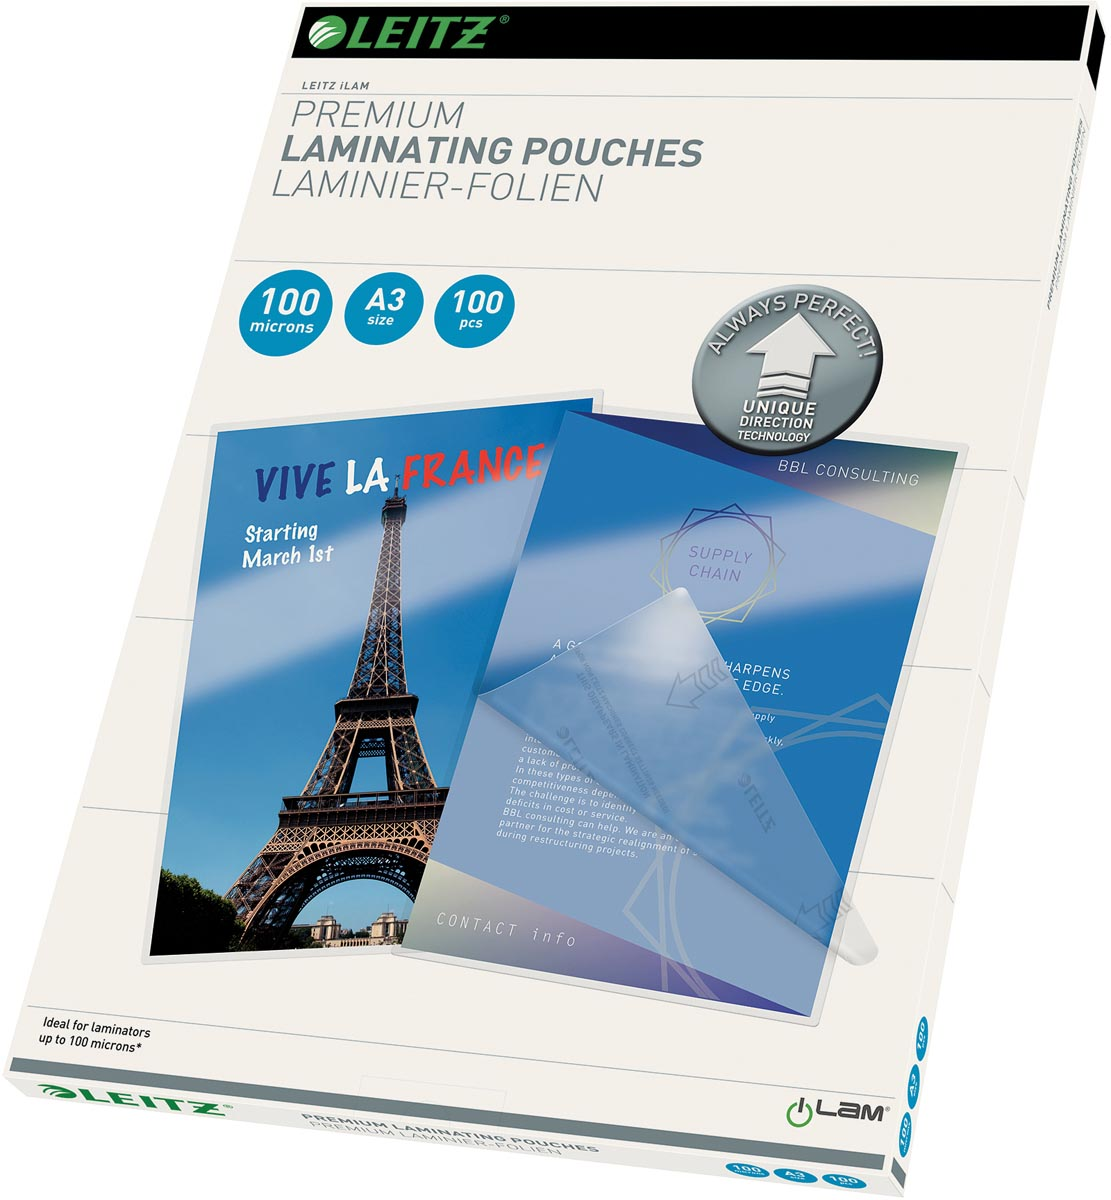 Leitz Ilam lamineerhoes ft A3, 200 micron (2 x 100 micron), pak van 100 stuks